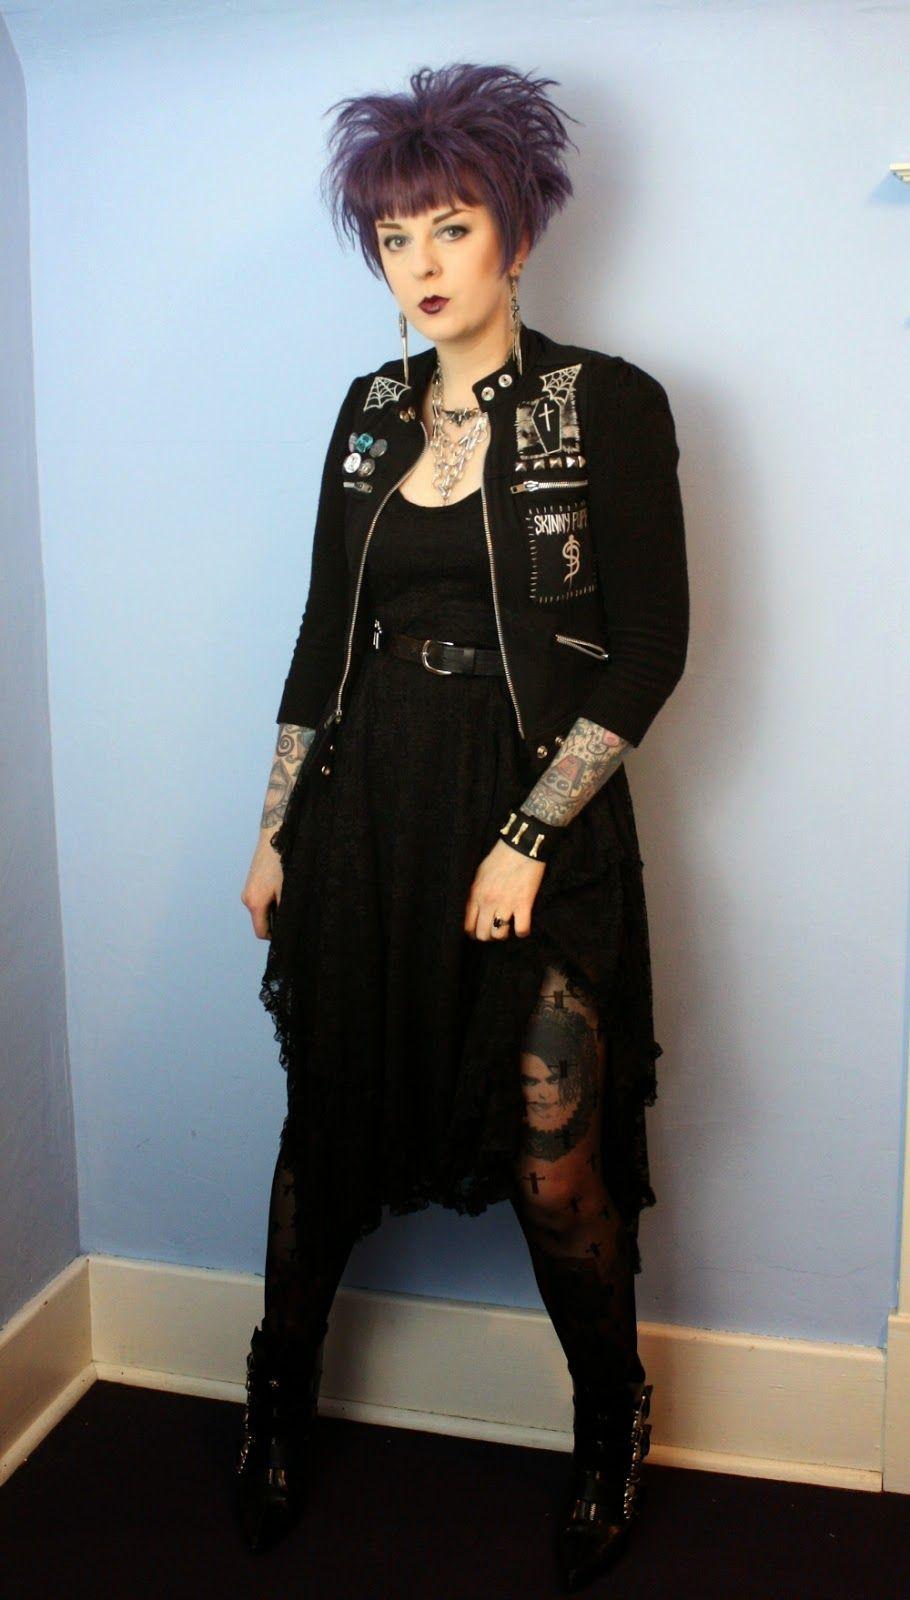 Coffin Kitsch | Alternative fashion, Fashion, Goth fashion